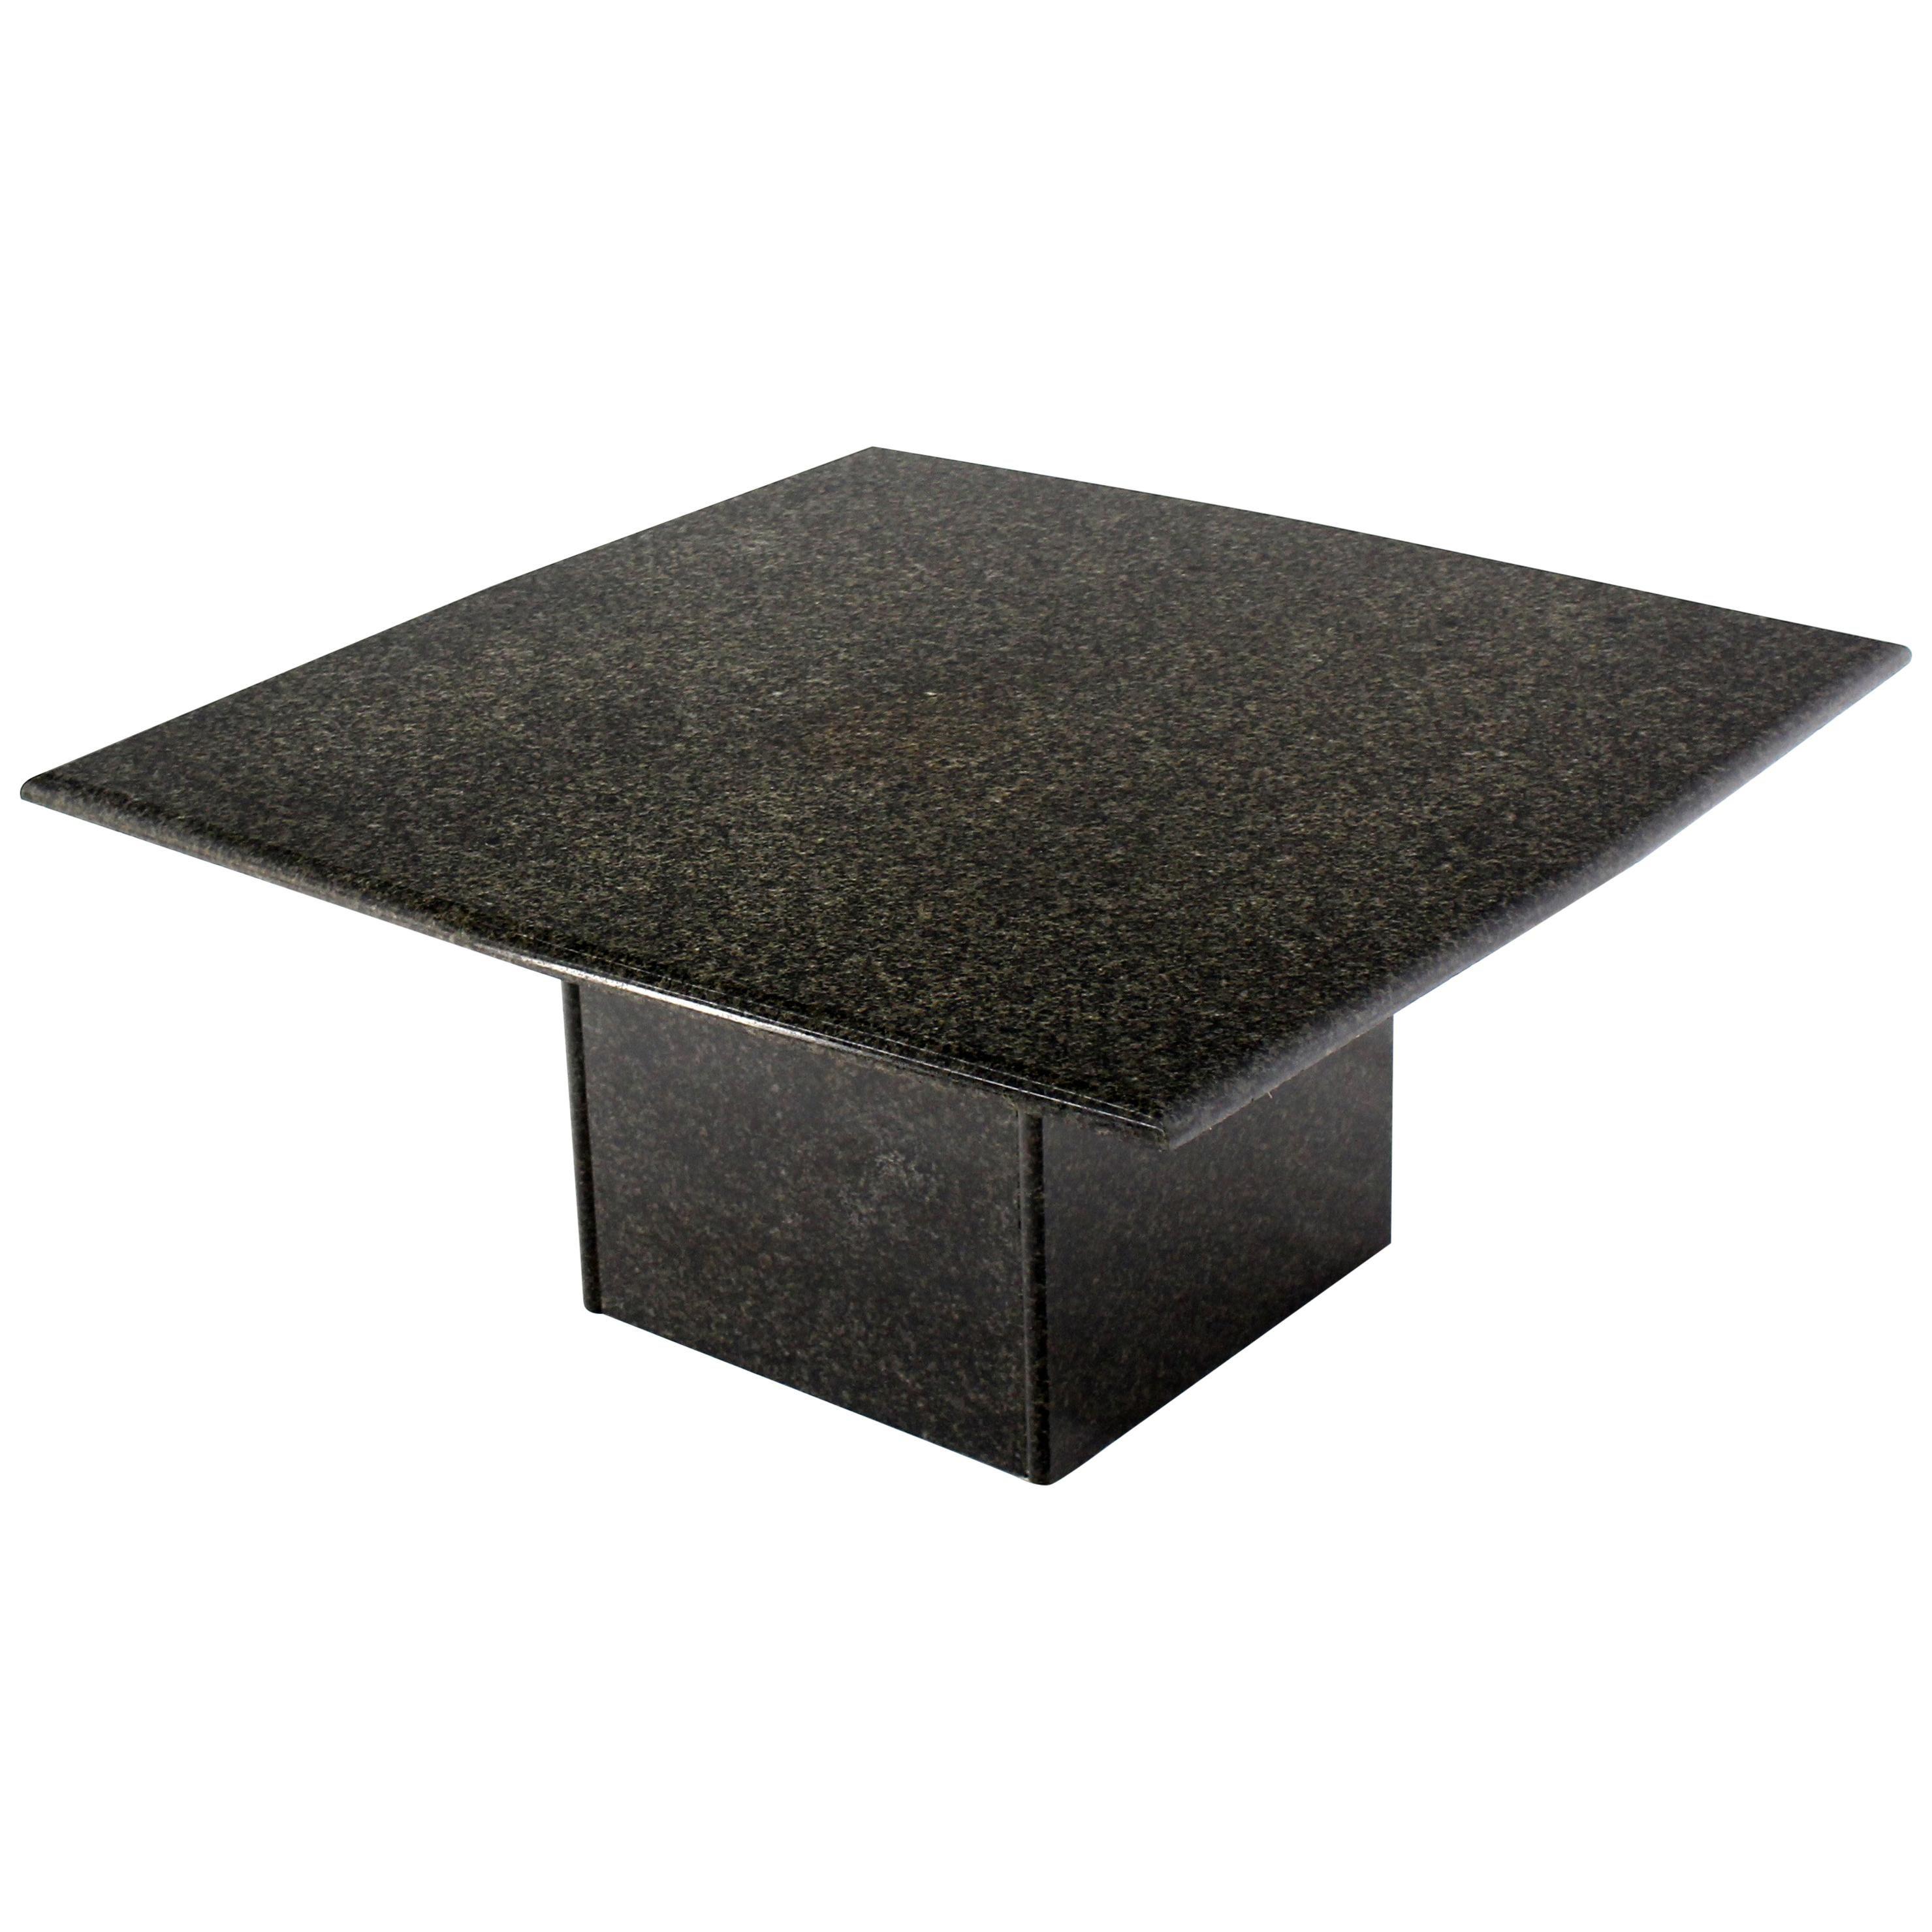 square black granite pedestal base coffee table